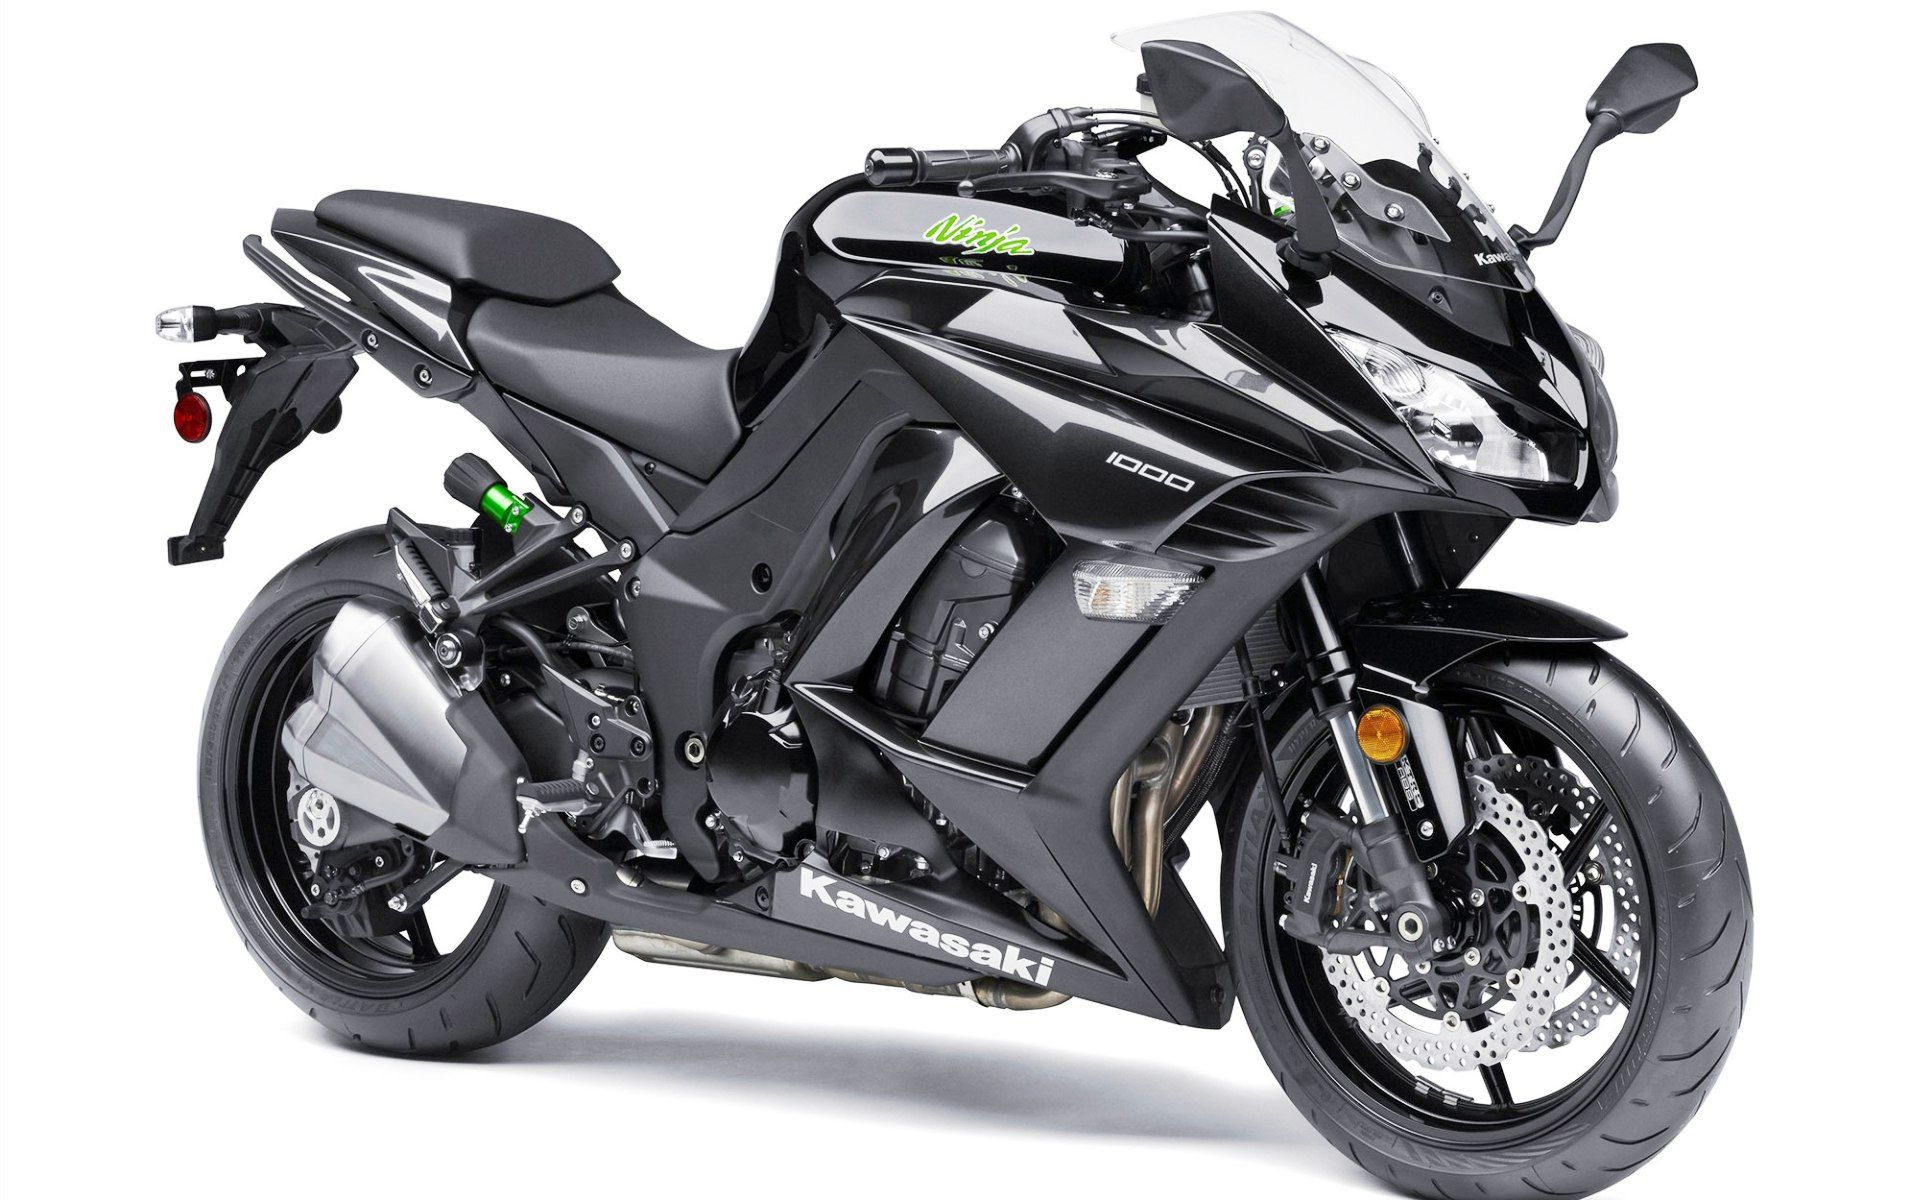 2015 Kawasaki Ninja 1000 ABS Black Wallpaper